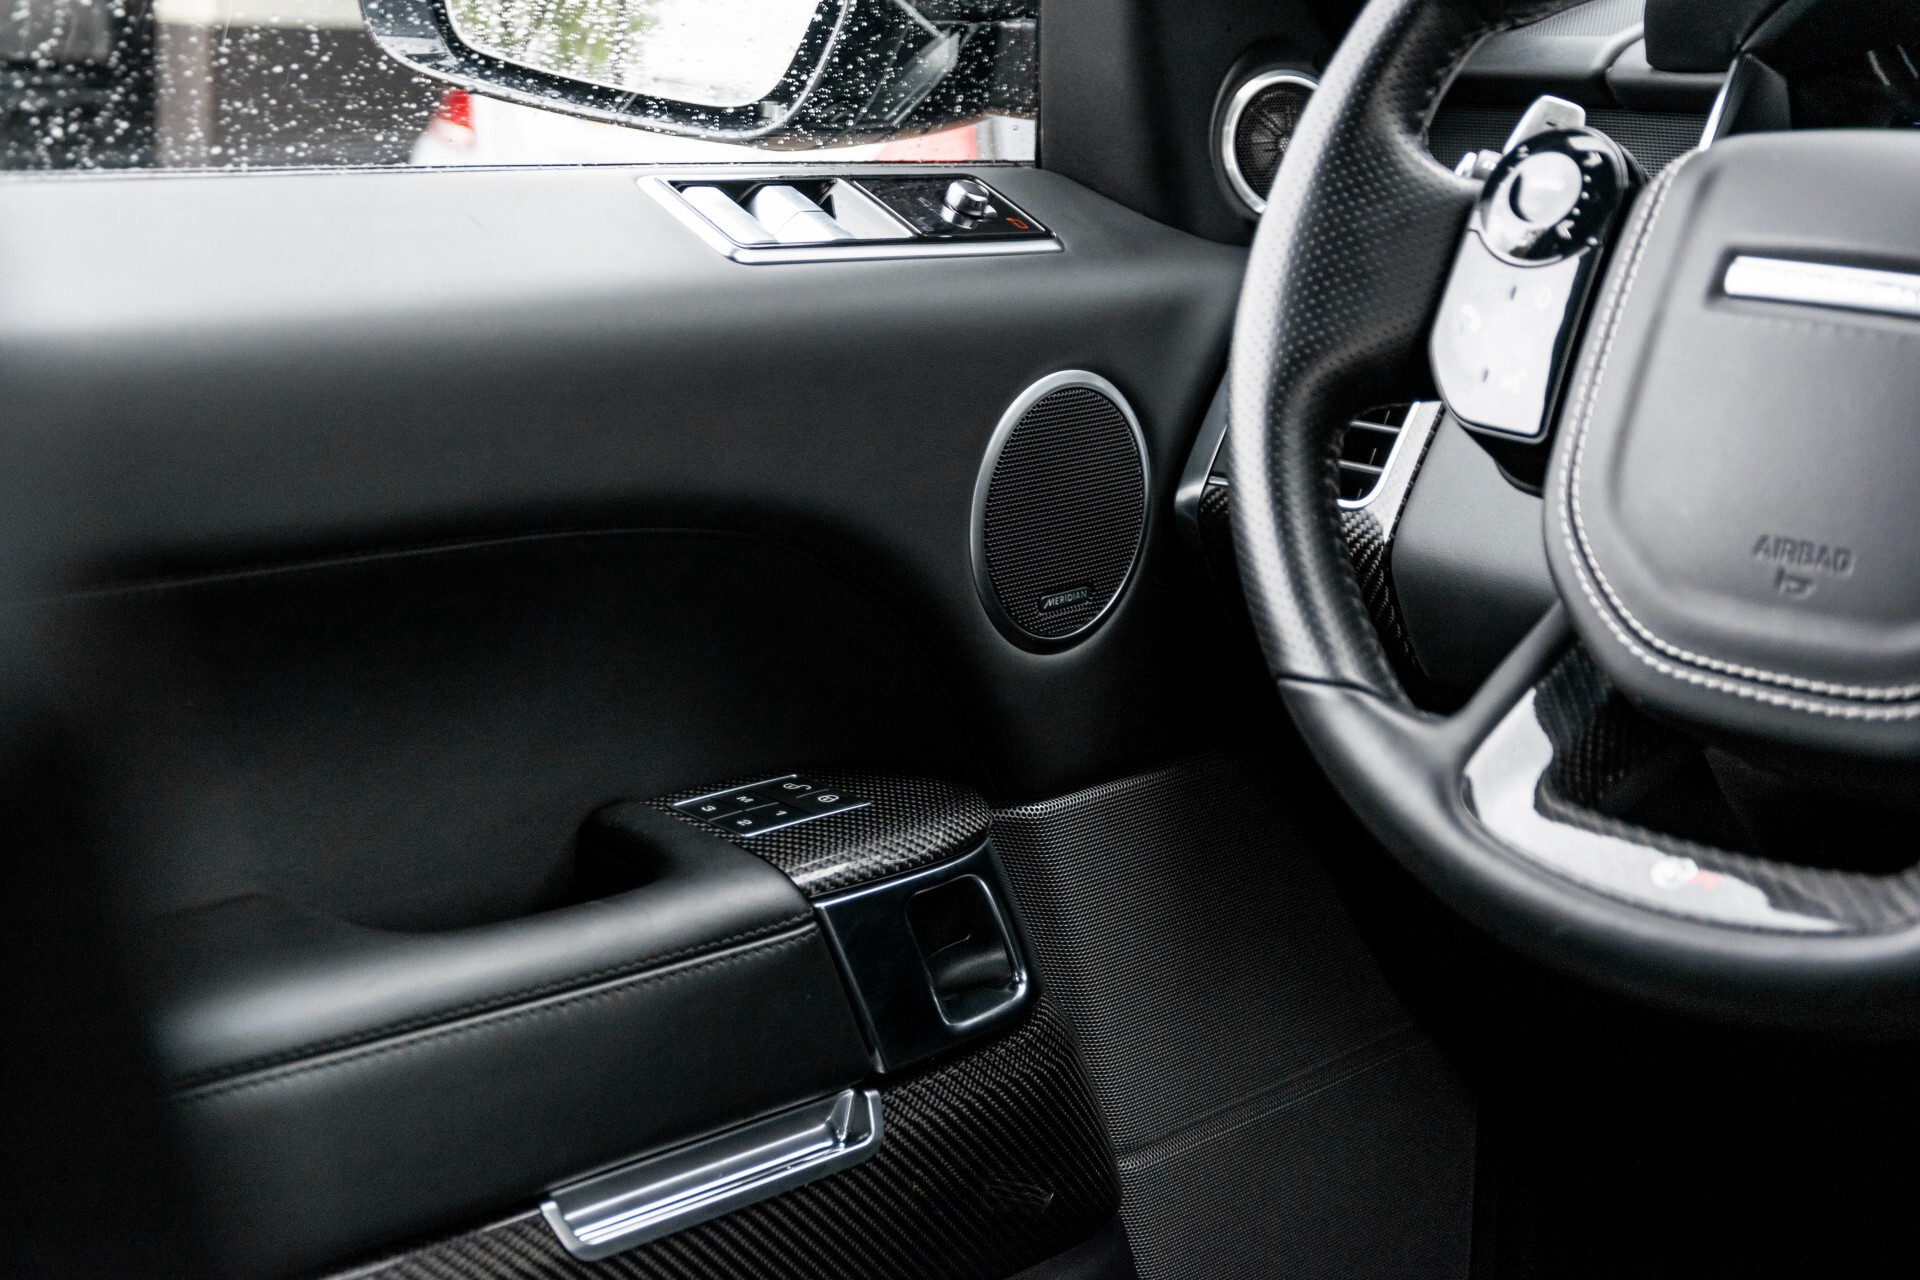 Land Rover Range Rover Sport SVR 5.0 Supercharged 575pk Full Carbon Nieuwprijs €241377 Foto 42